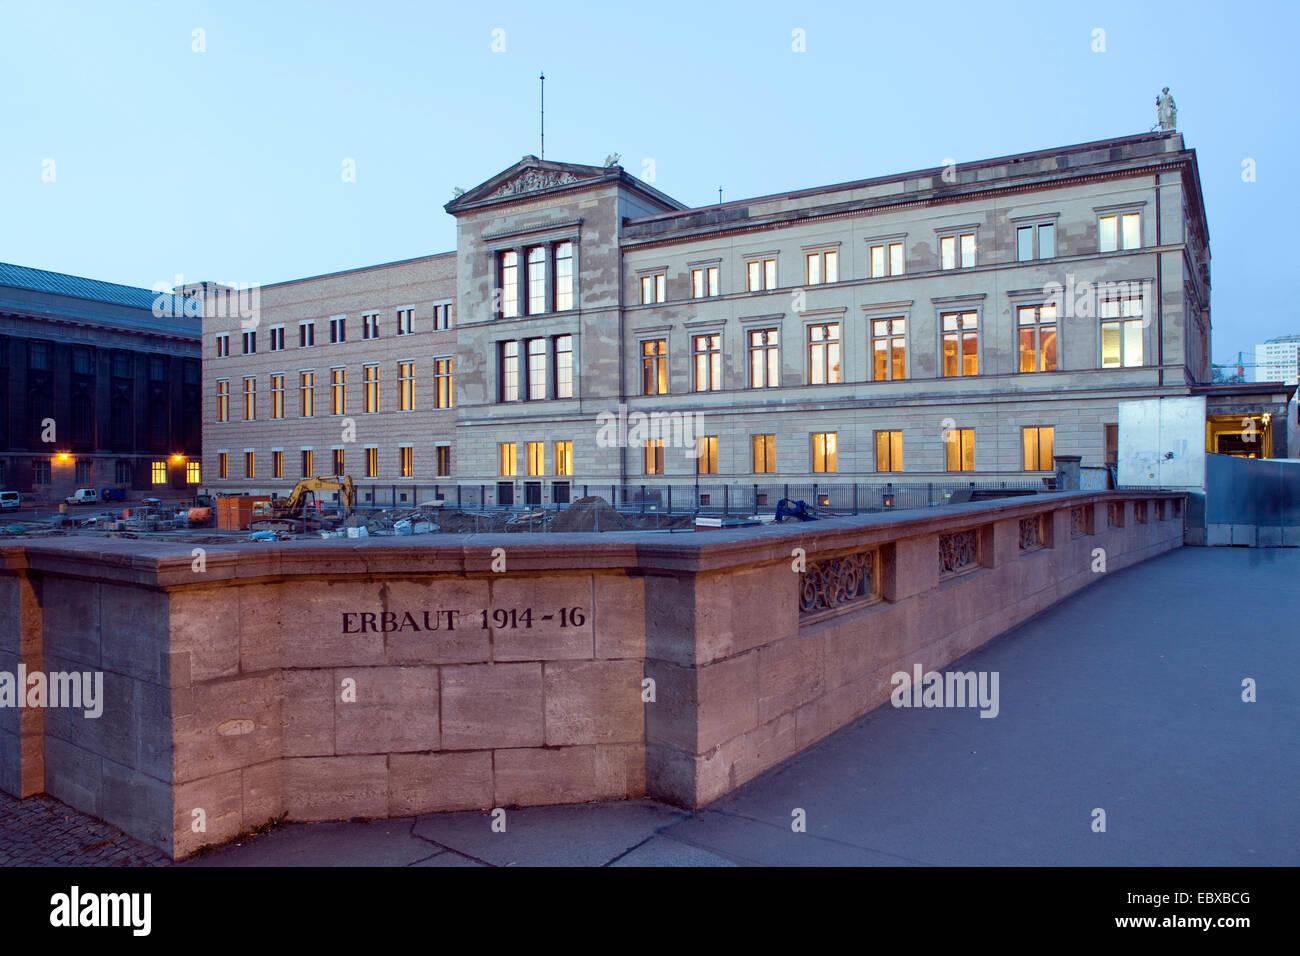 Neues Museum in Berlin, Germany, Berlin Stock Photo